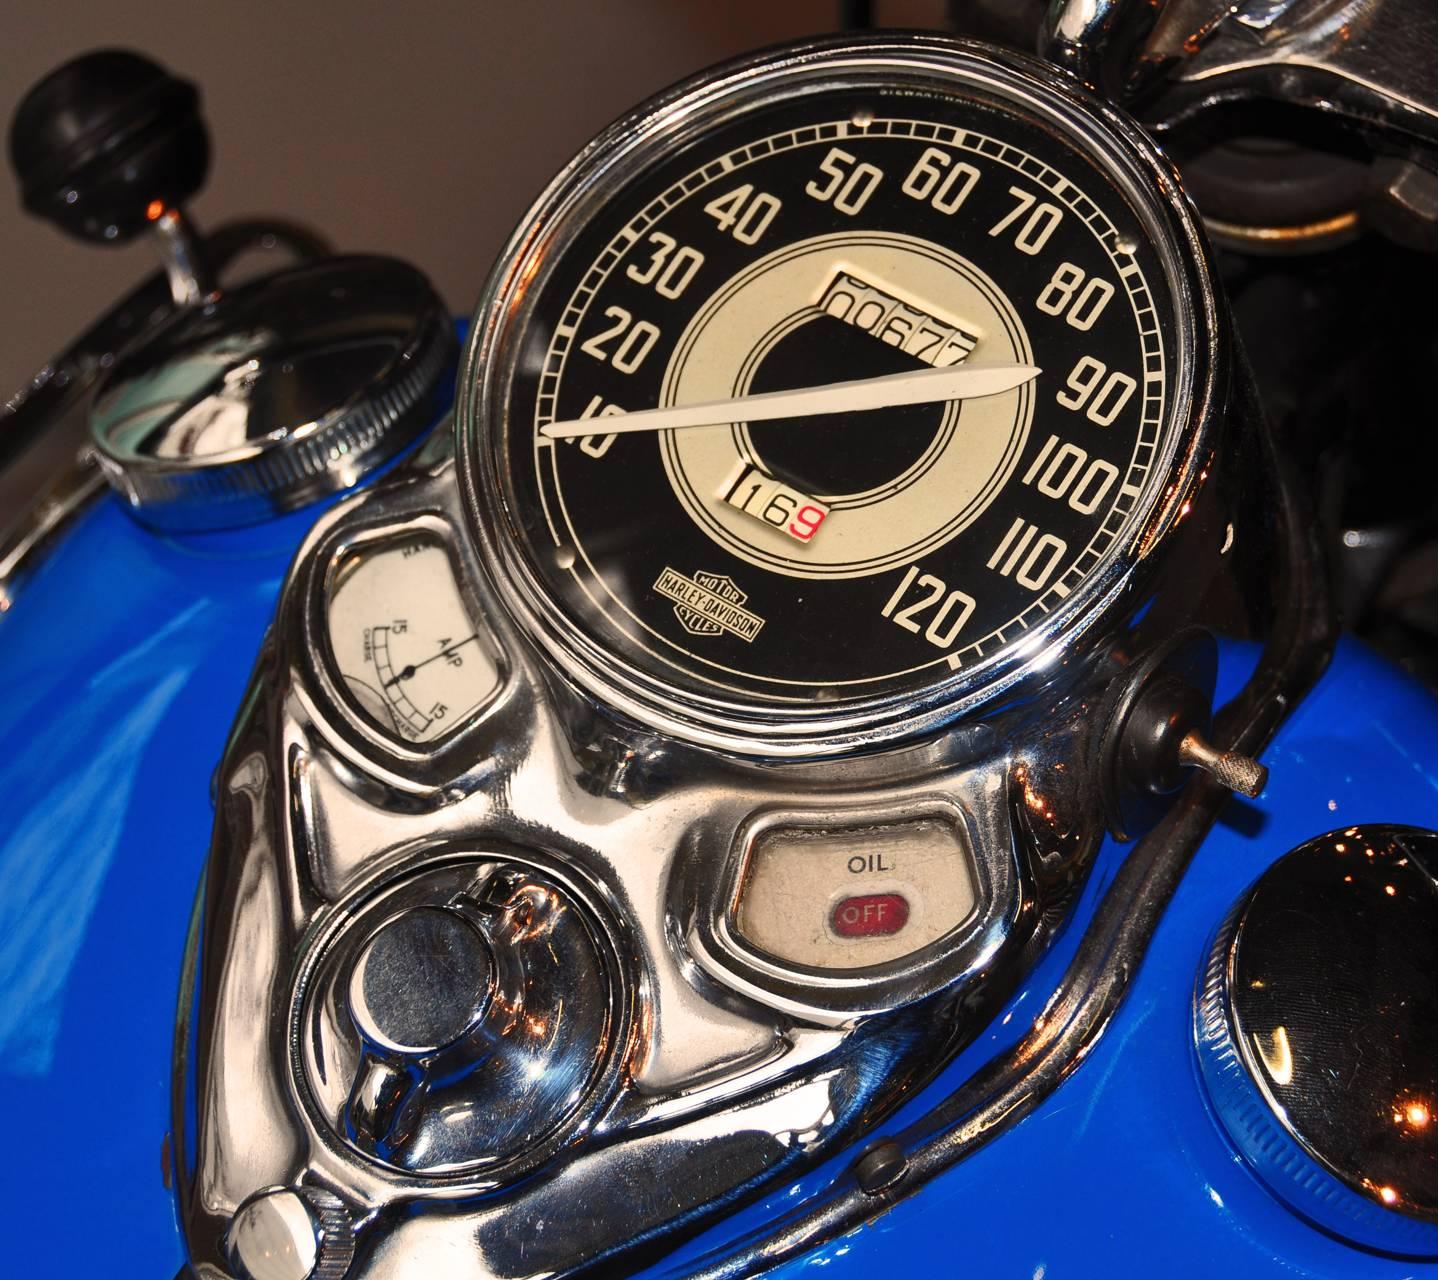 A Harley 6